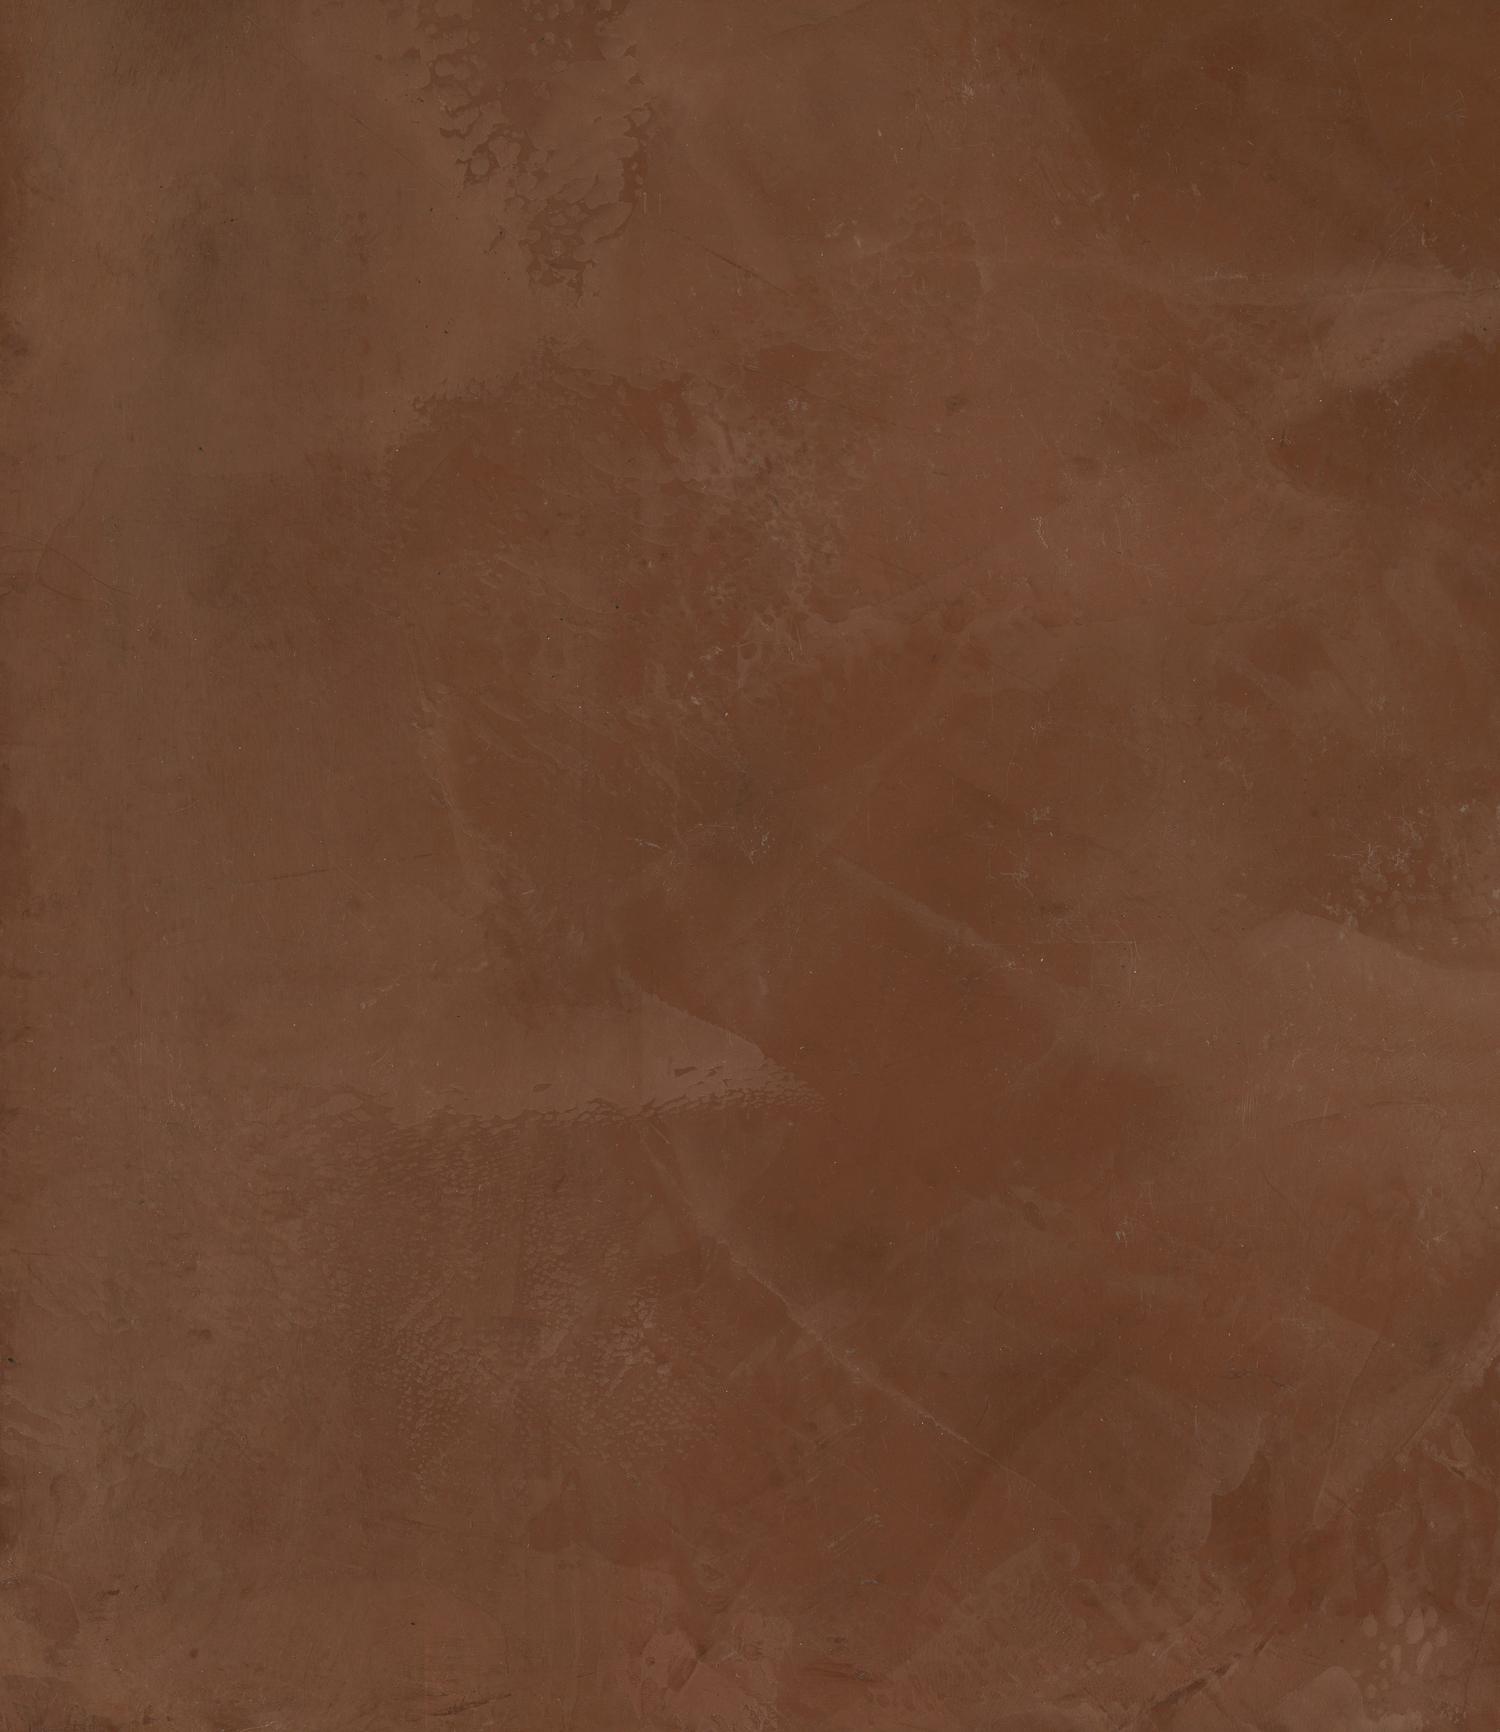 Chocolate Brown Venetian Plaster